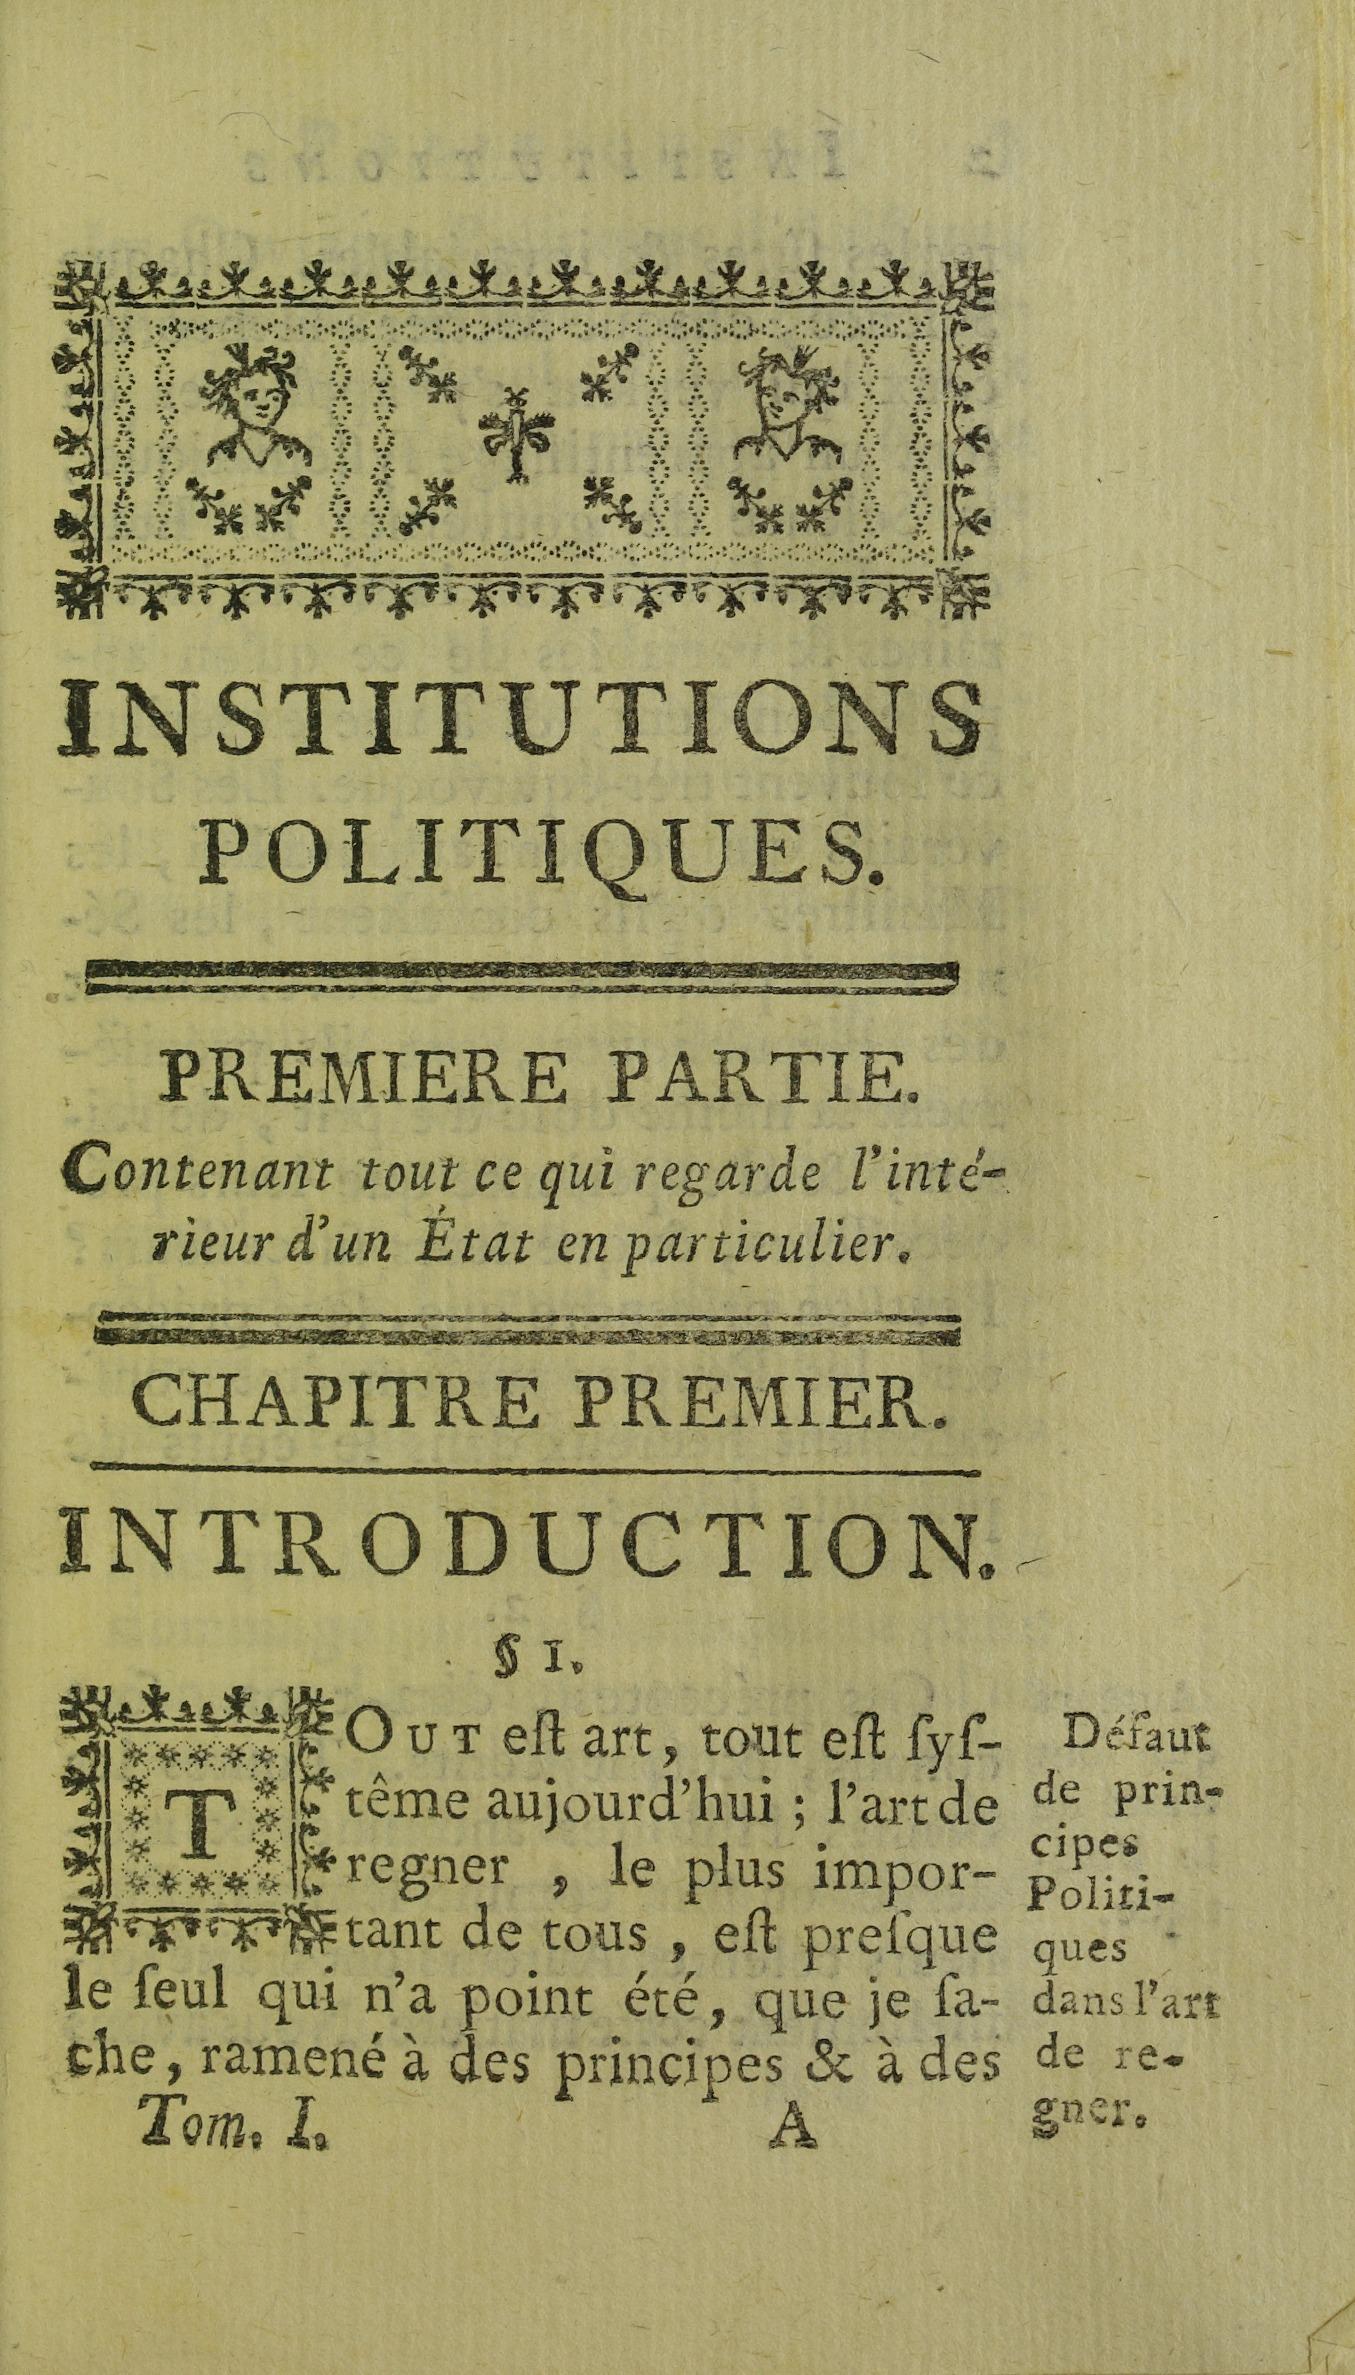 historical institutionalism Neo-statecraft theory, historical institutionalism and institutional change - volume 51 issue 1 - toby s james.